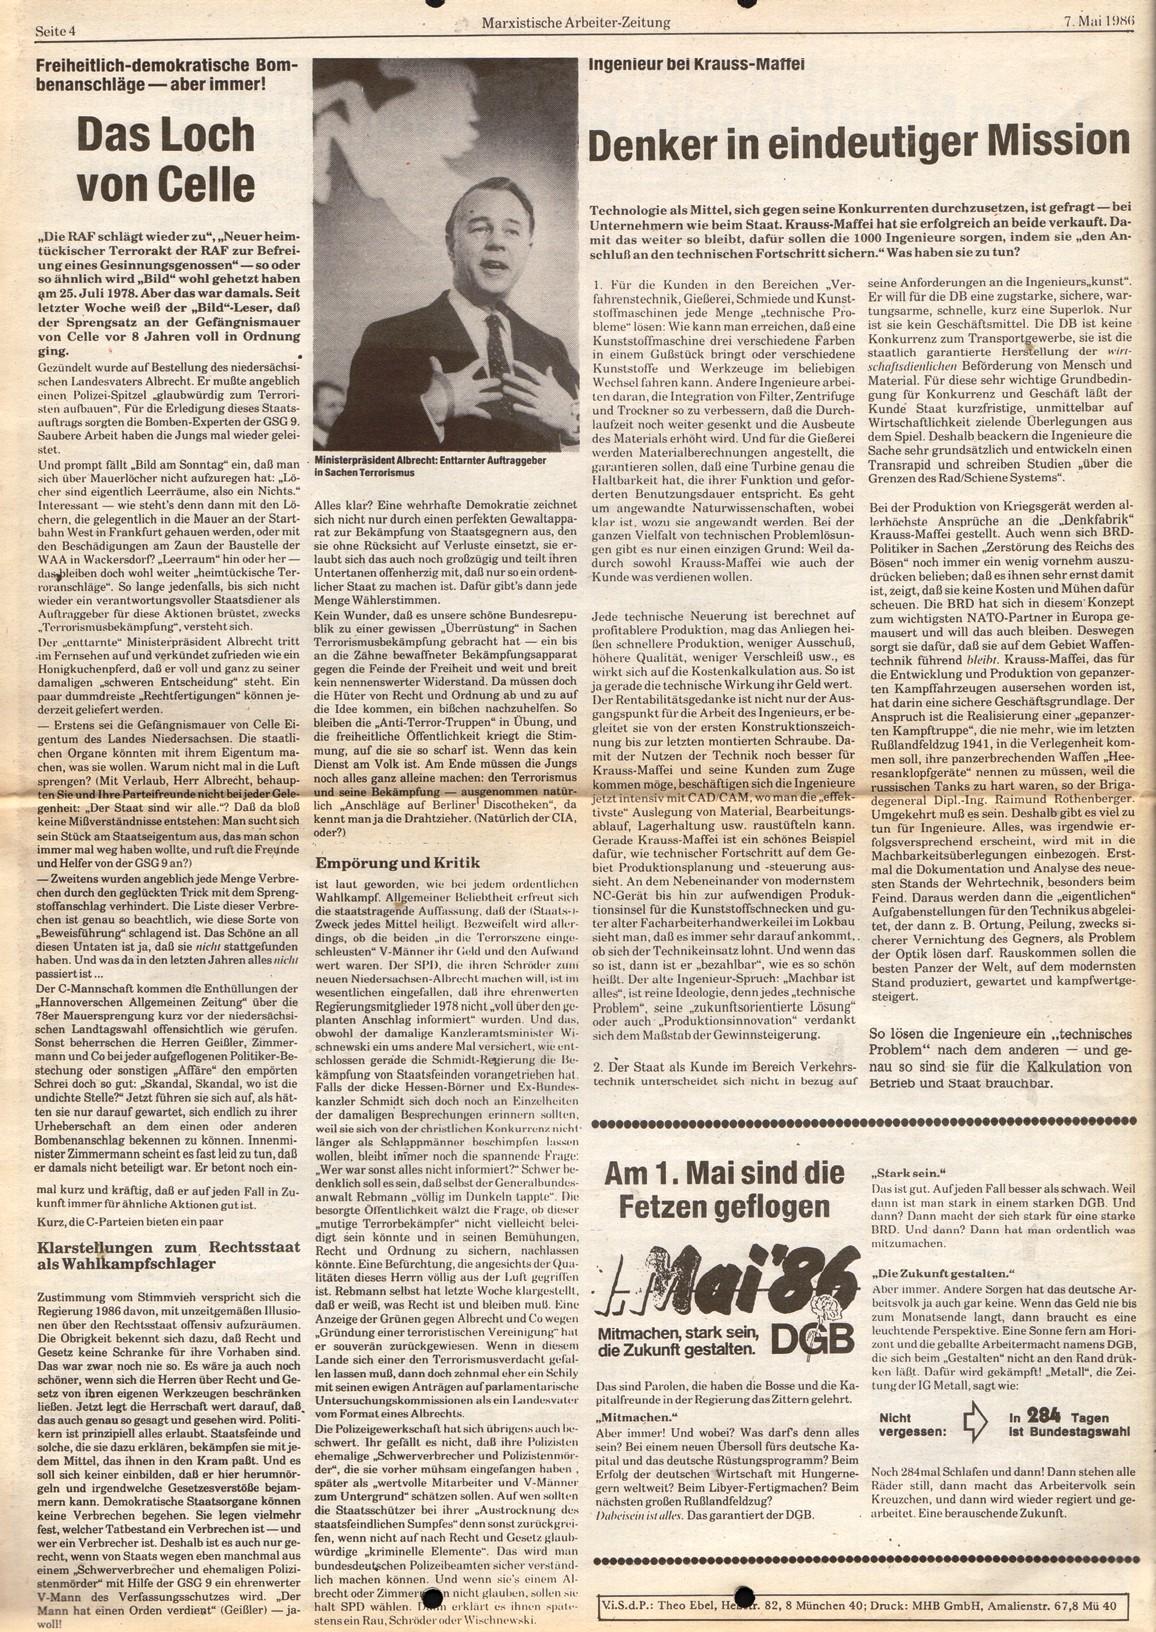 Muenchen_MG_MAZ_Krauss_Maffei_19860507_04